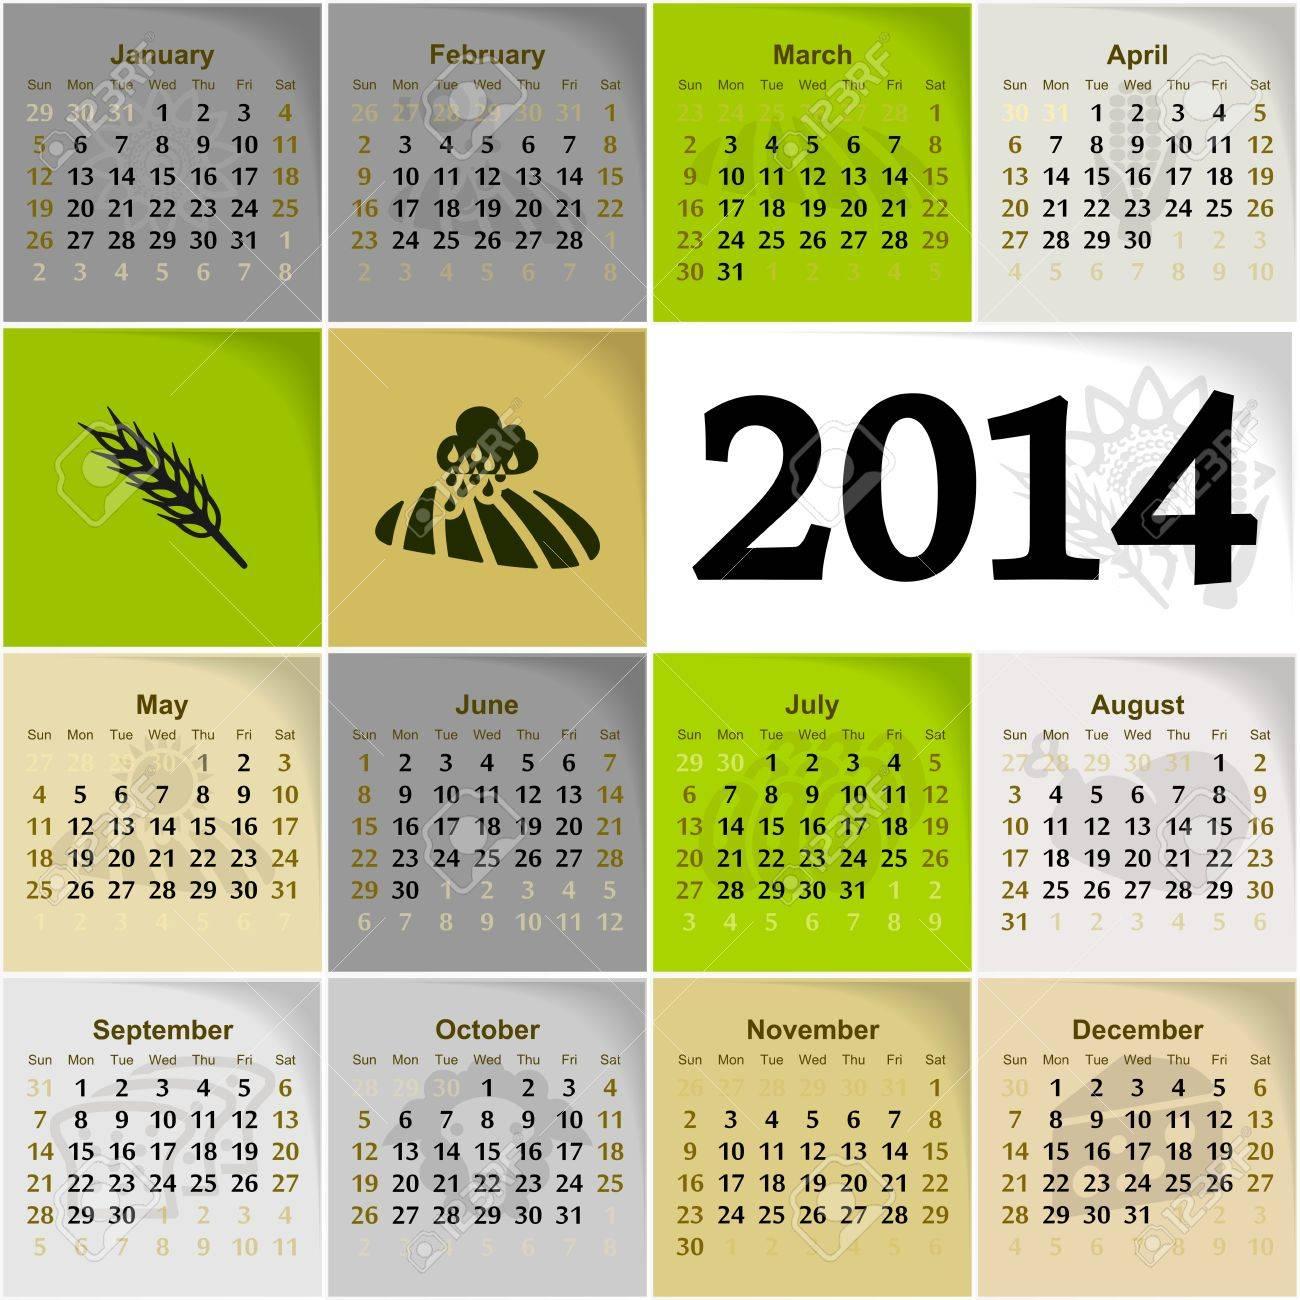 2014 agriculture calendar illustration Stock Vector - 22150597